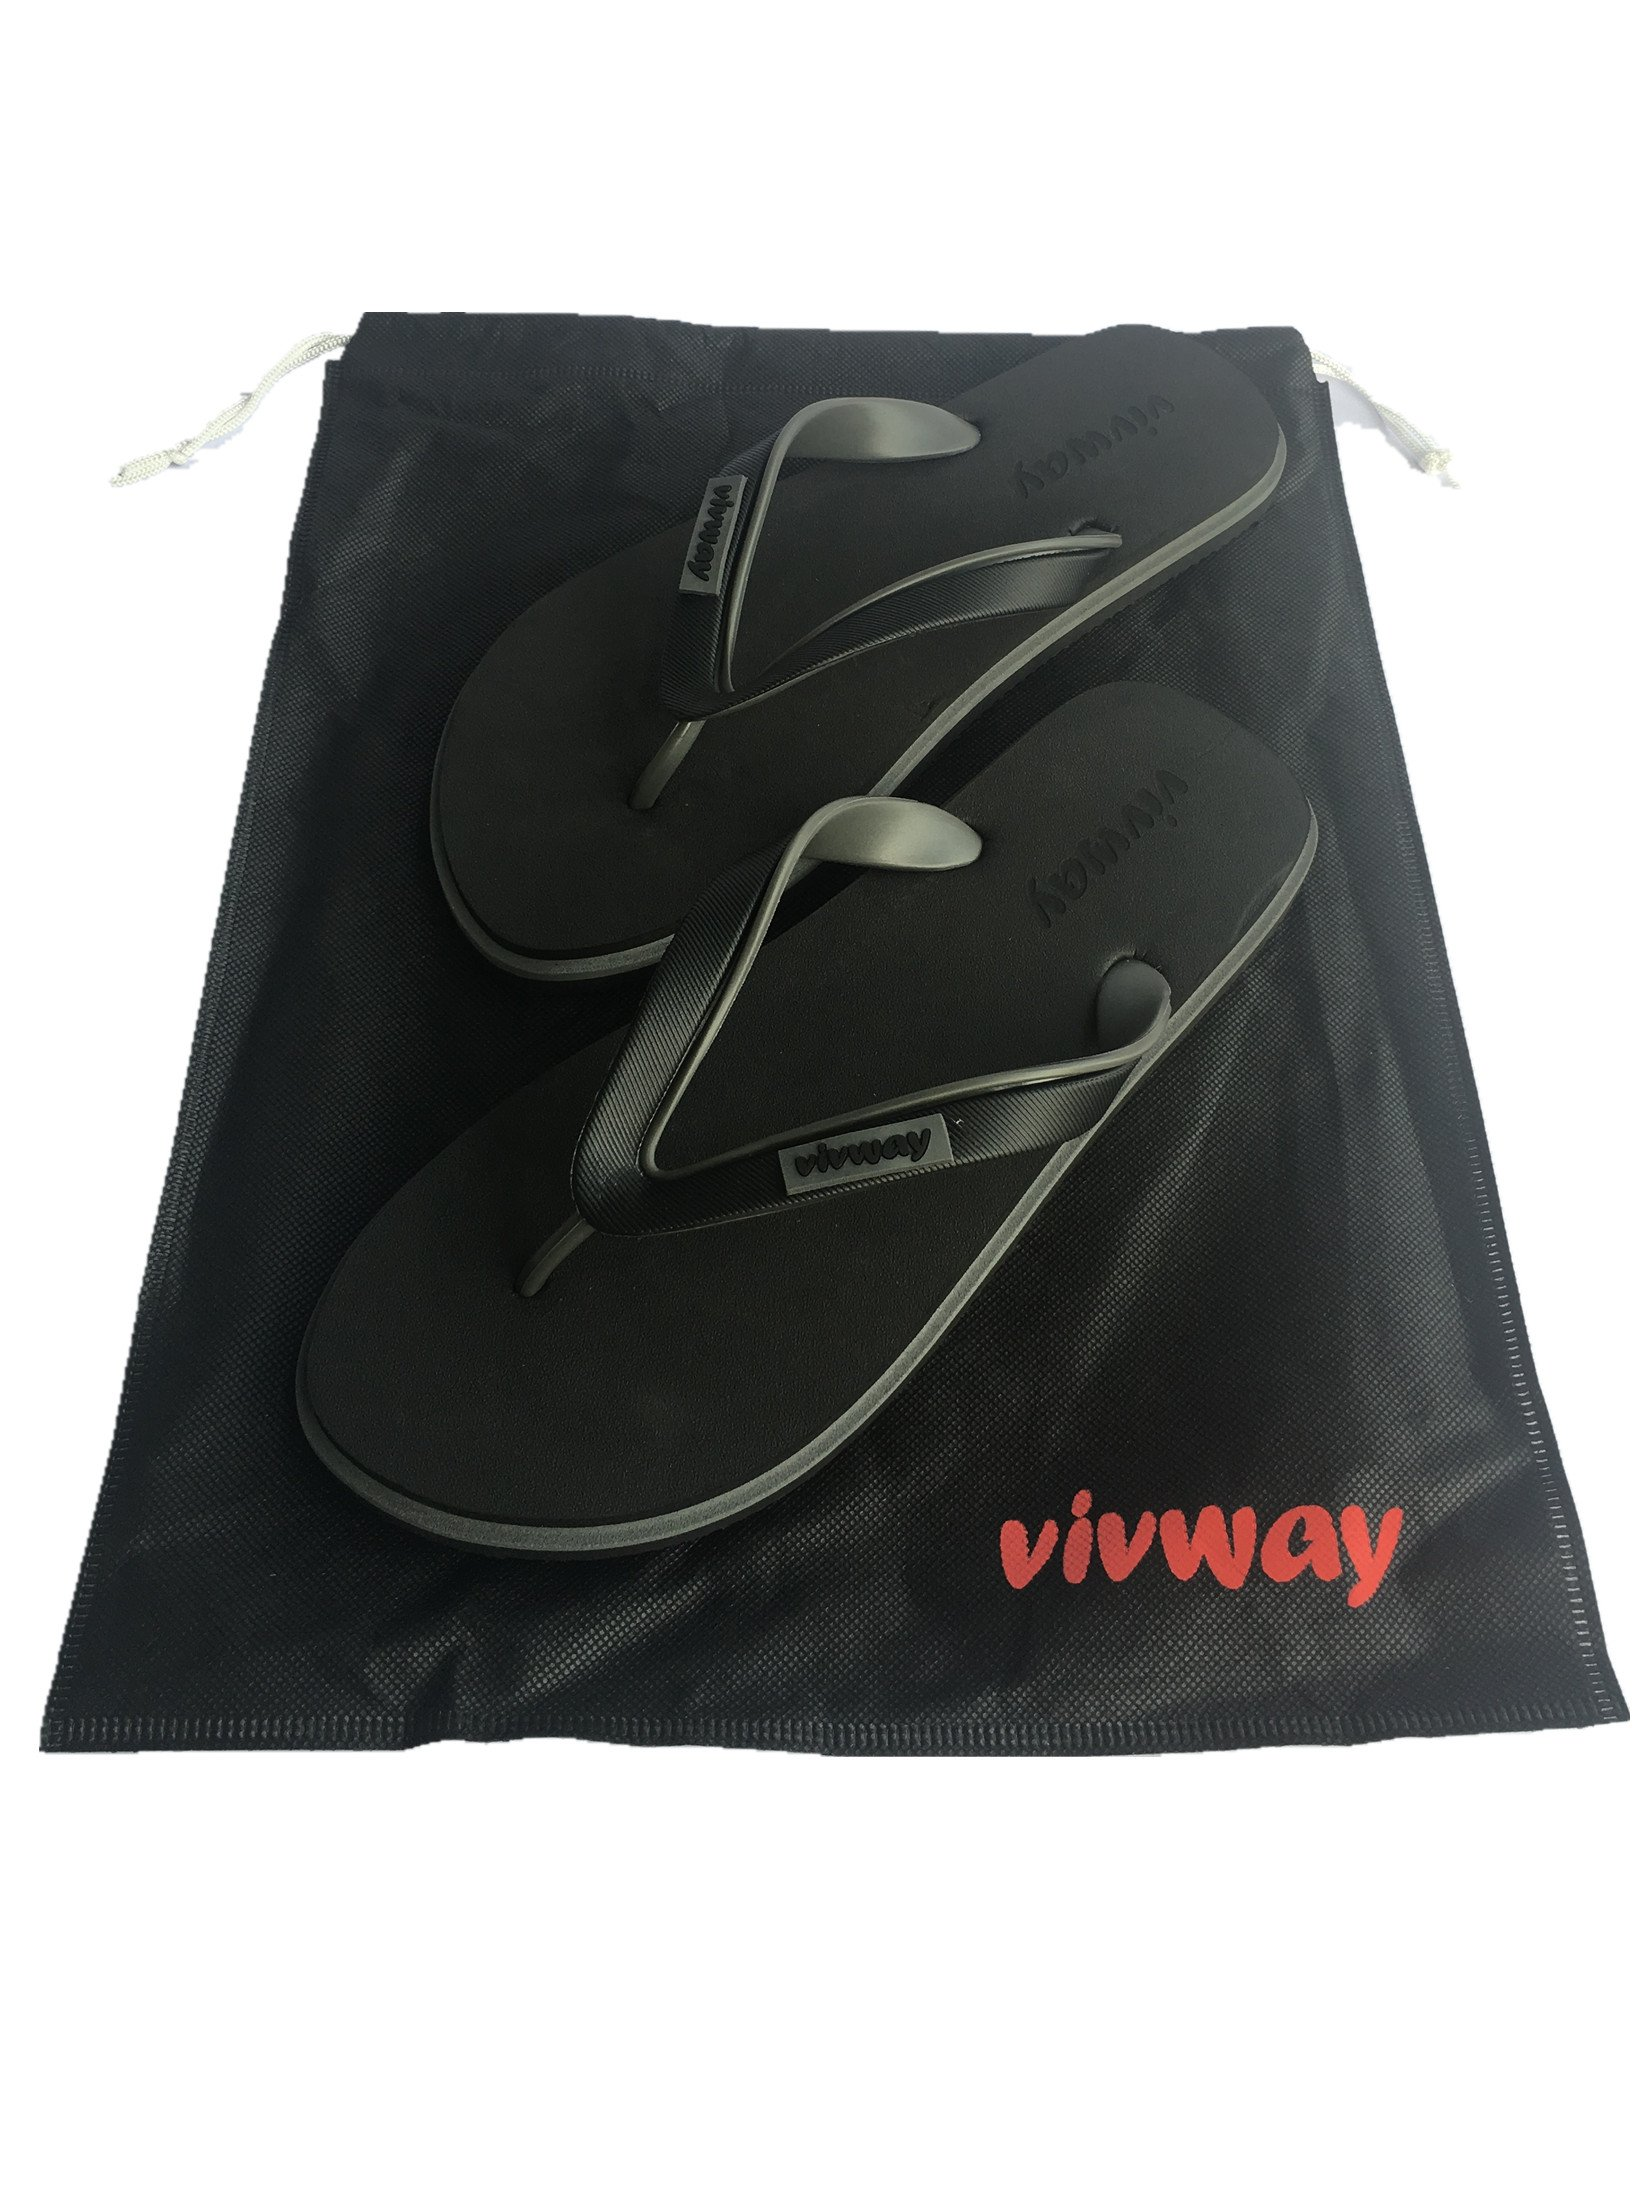 VIVWAY Men's Summer Beach Flip-Flops Thongs Flexible Fashion Sandals Classical Lightweight Non-Slip Black Slippers US7